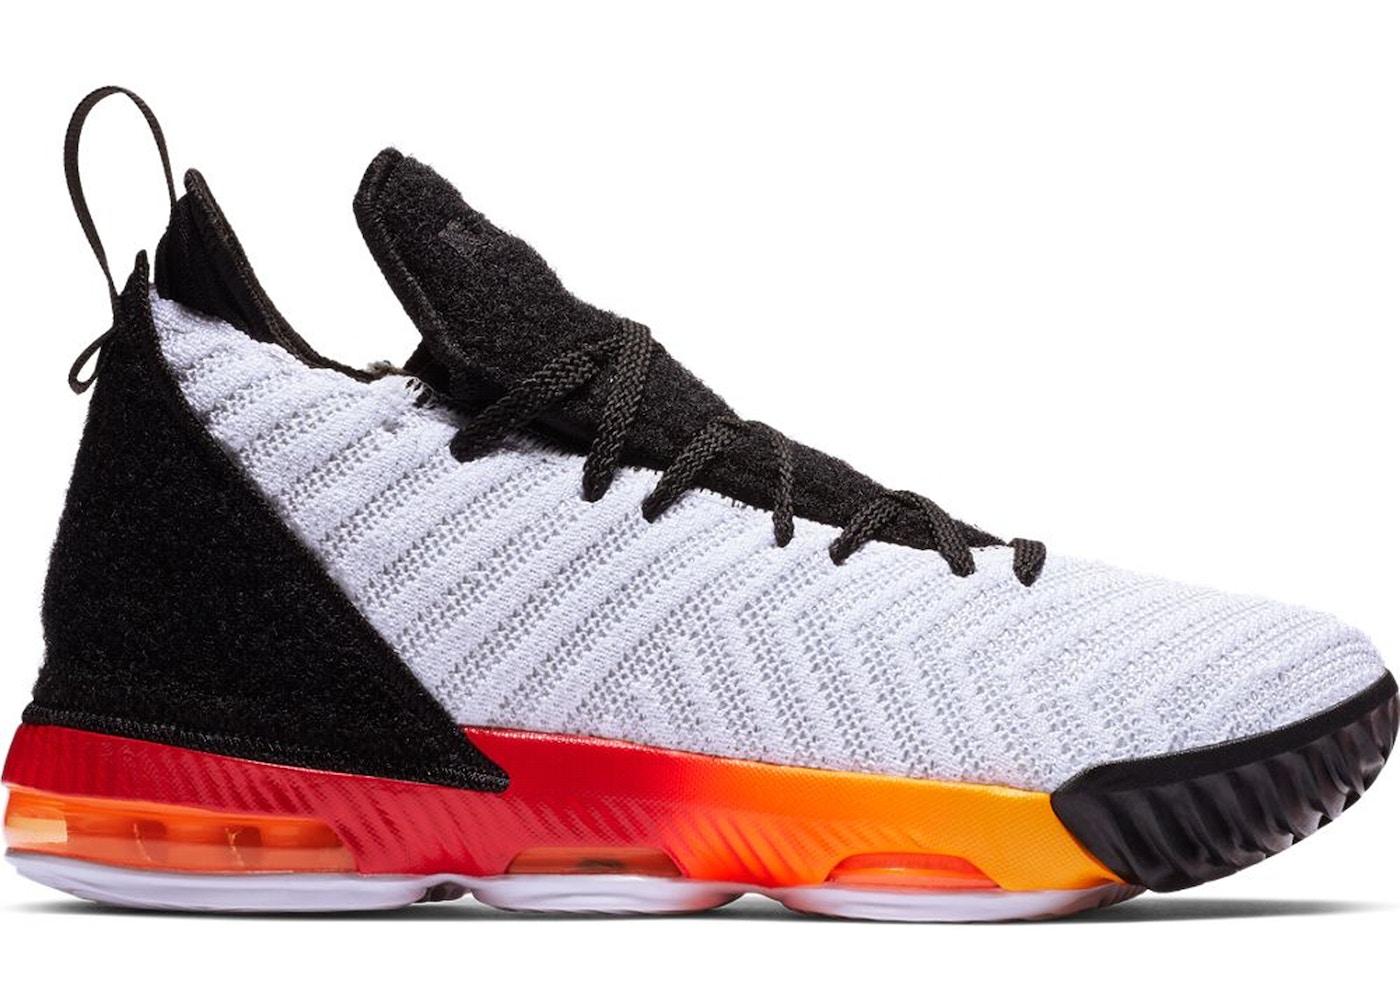 52b8b1ded08 Nike LeBron Shoes - Release Date